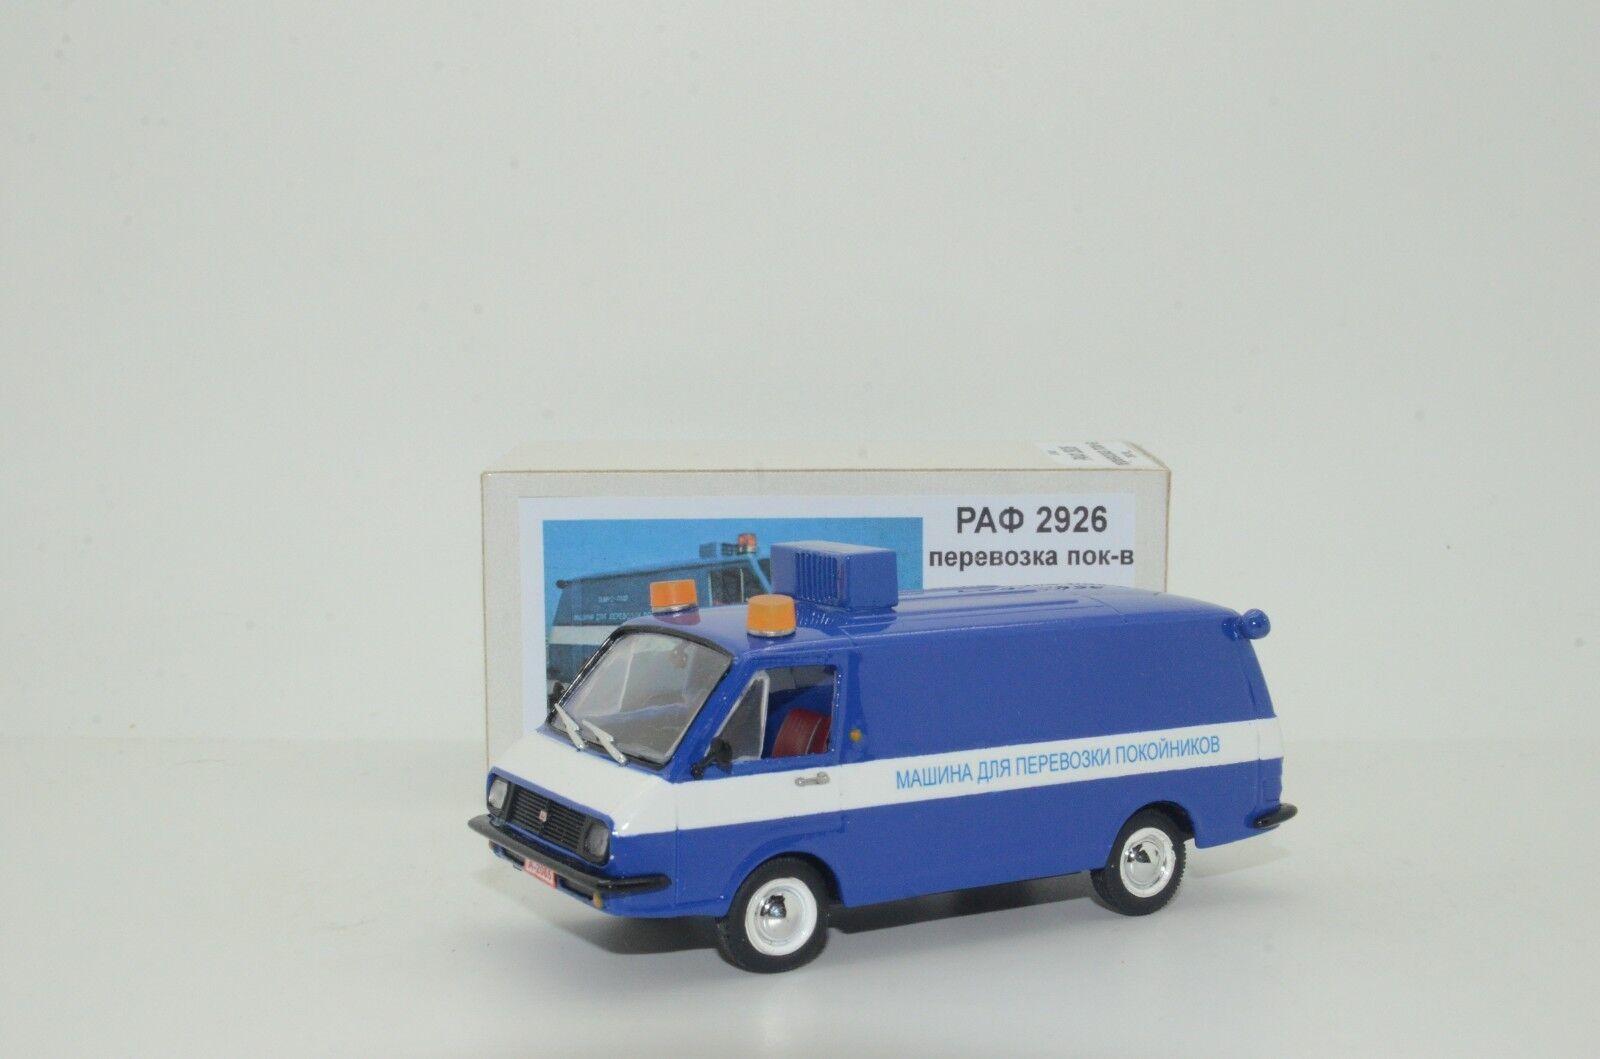 rara RAF 2926 forense coche hecho a mano 1/43